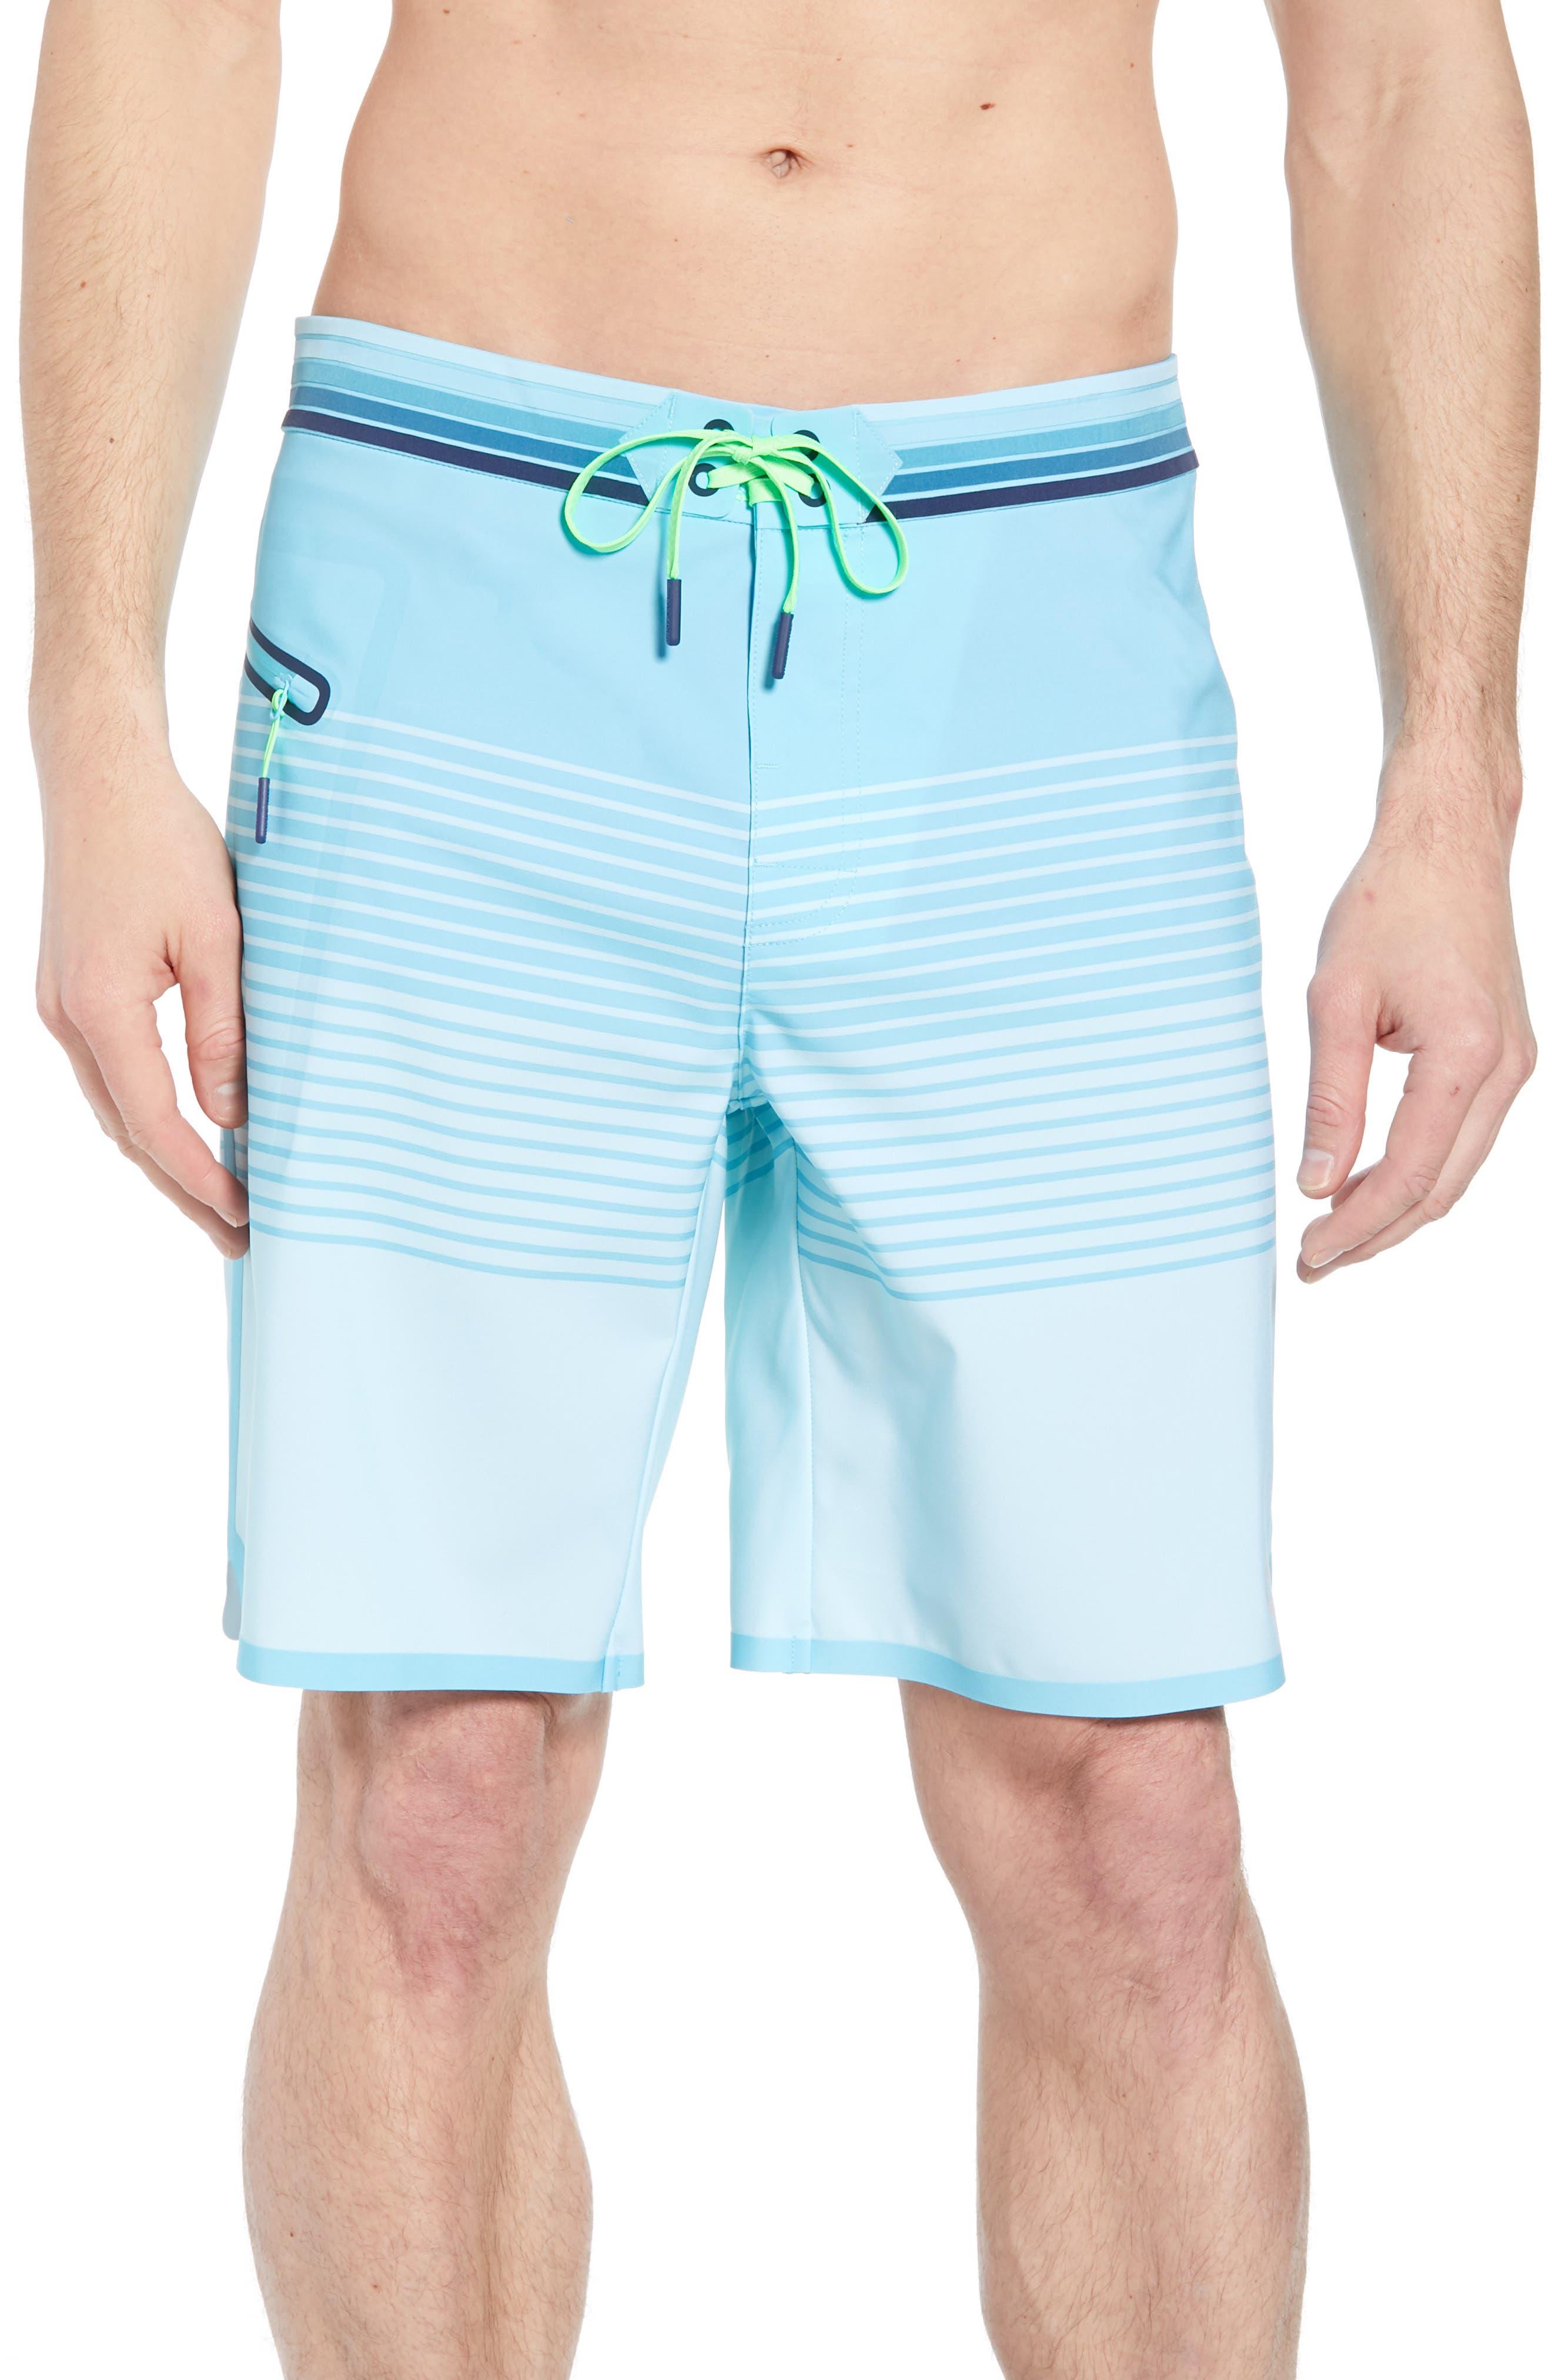 VINEYARD VINES,                             Sculplin Stripe Tech Board Shorts,                             Main thumbnail 1, color,                             459